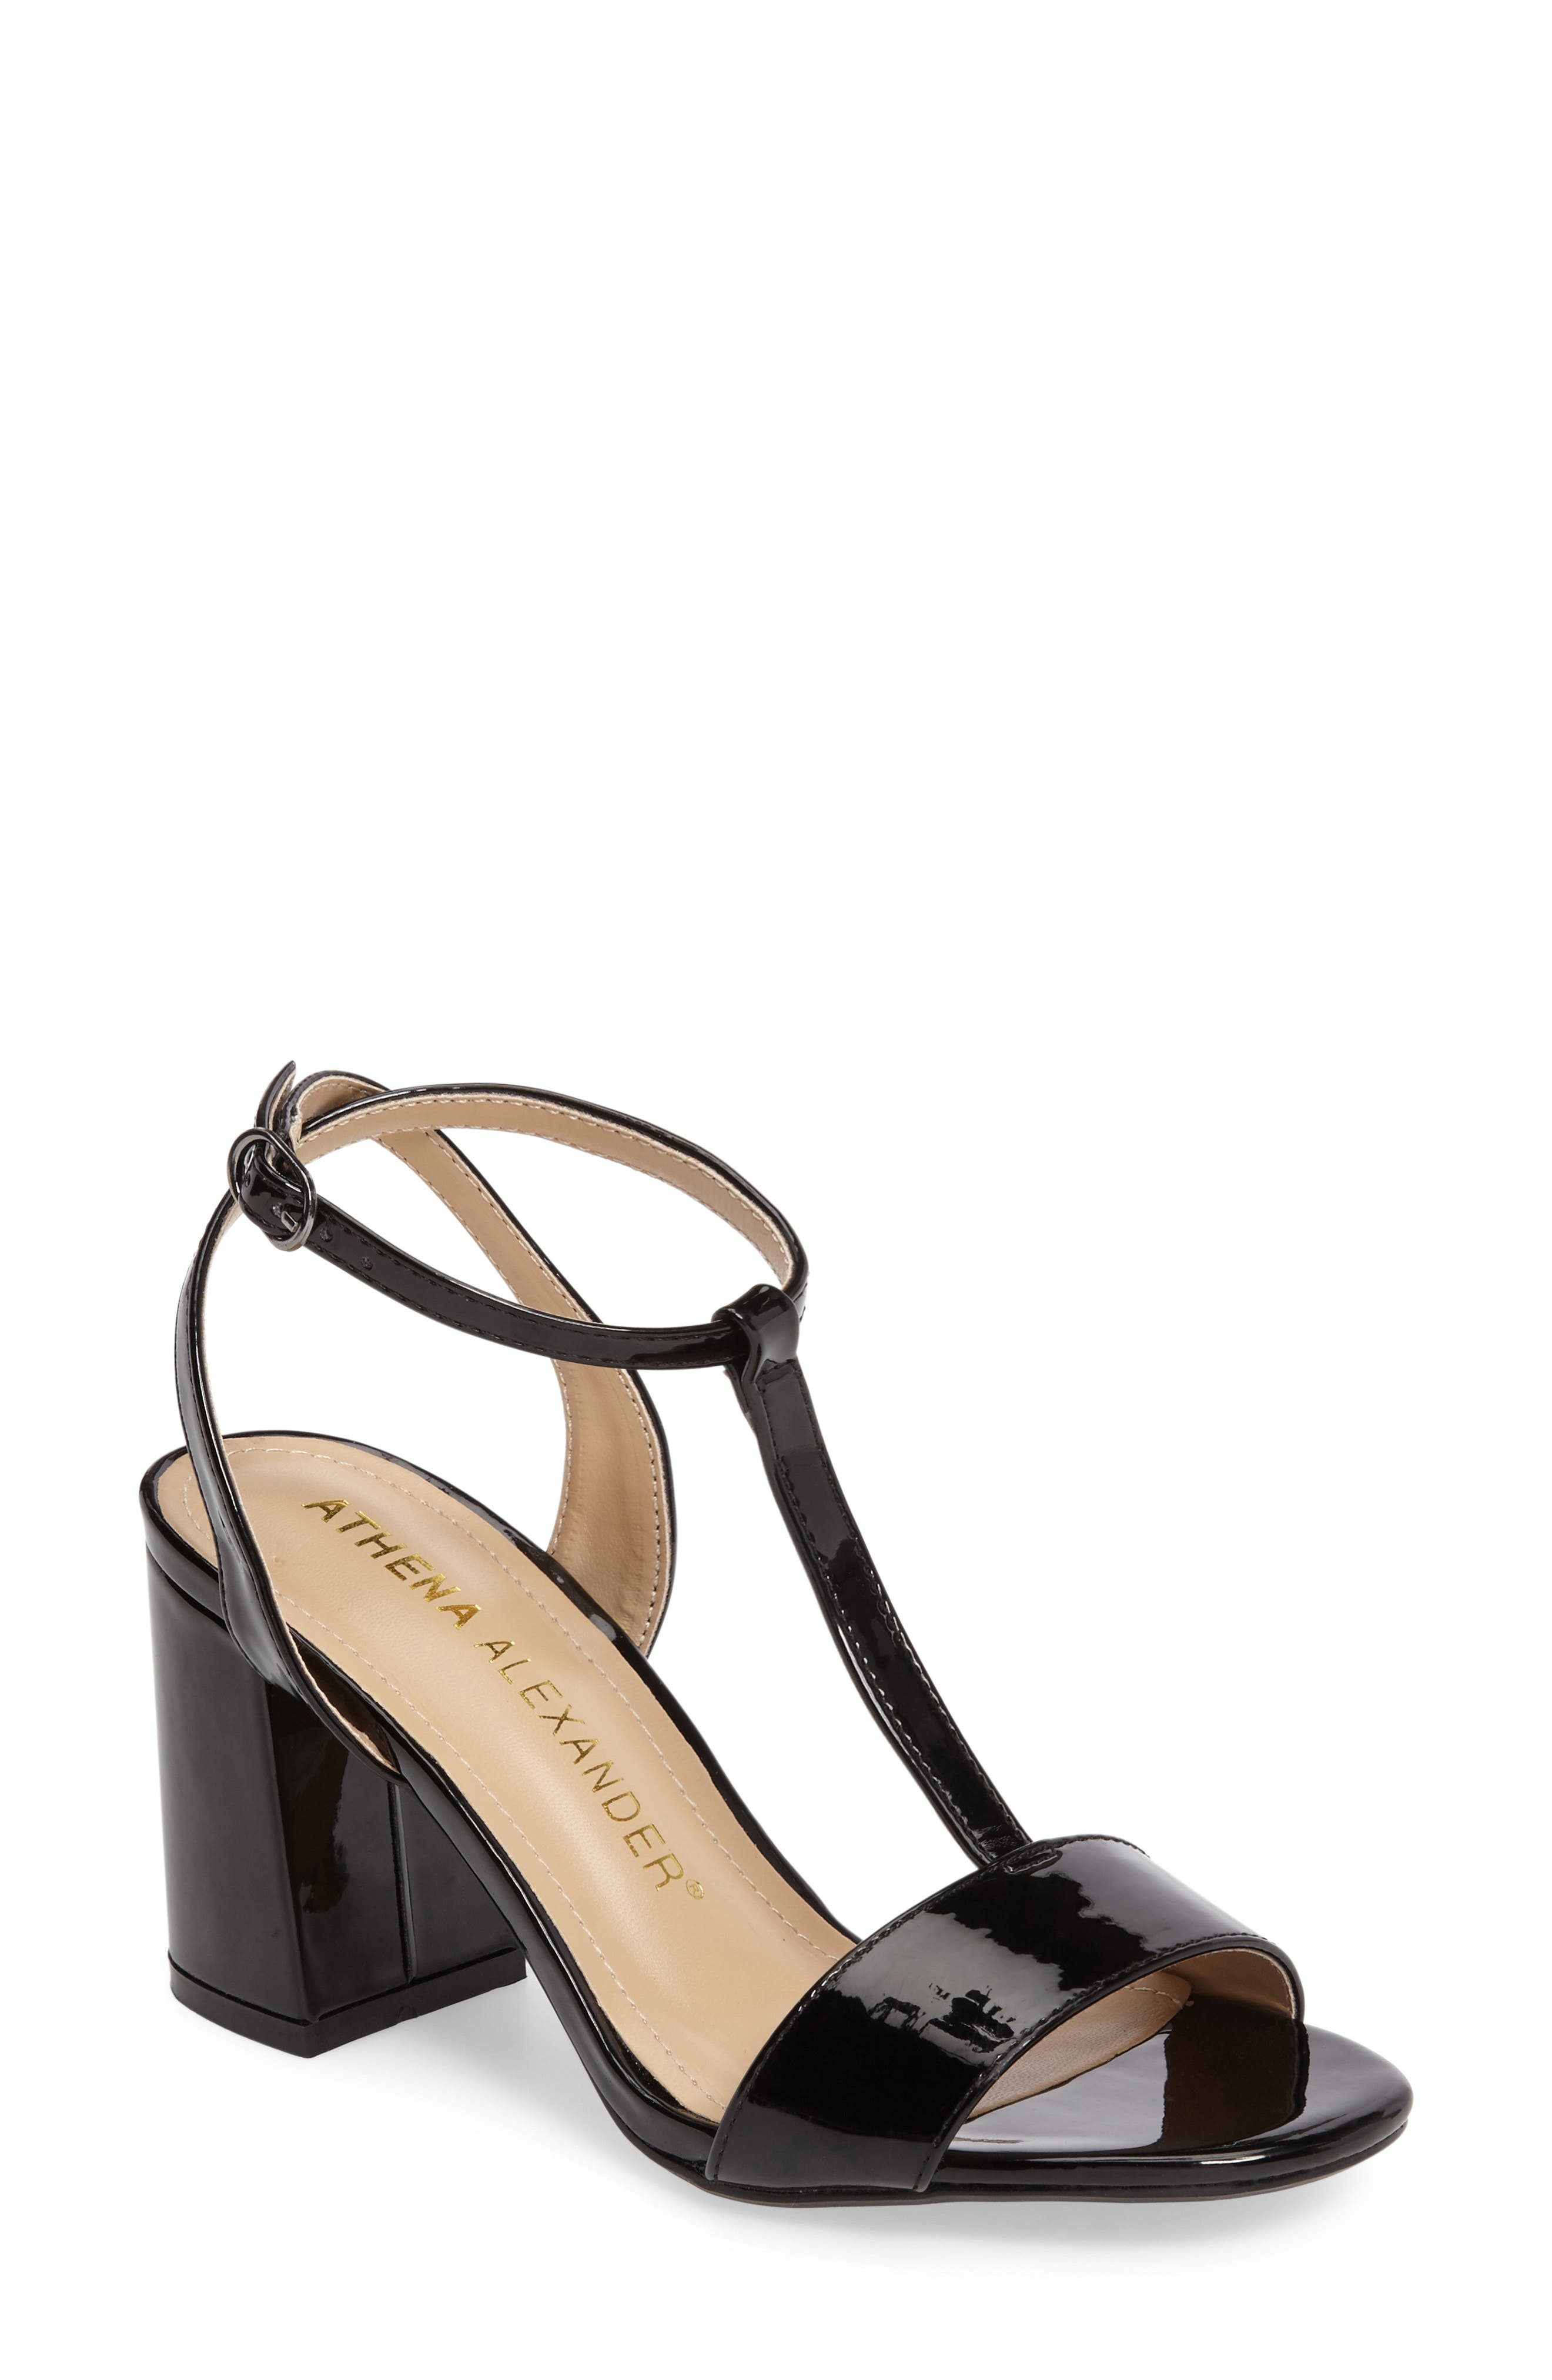 Ditaa T-Strap Sandal,                             Main thumbnail 1, color,                             Black Faux Patent